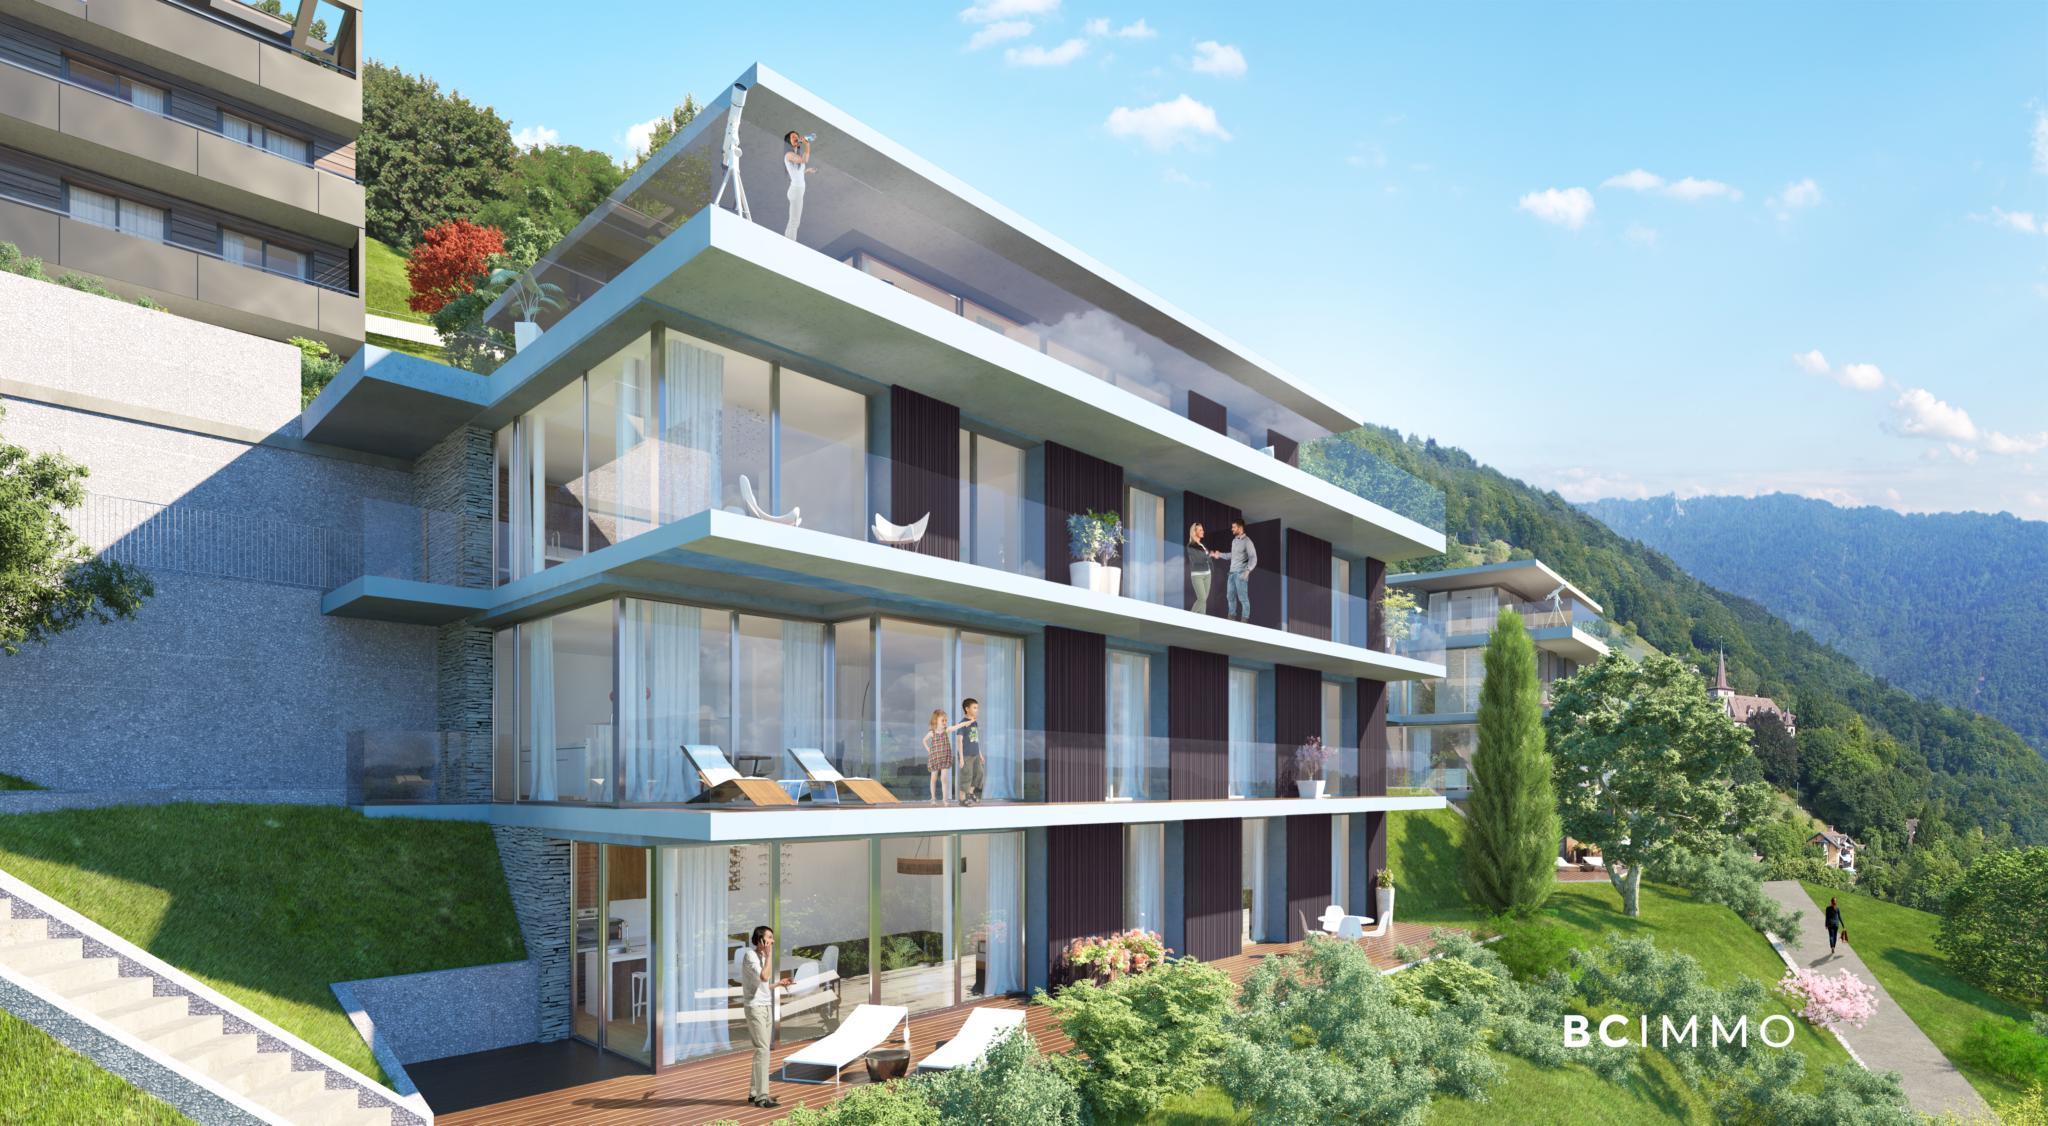 BC Immo - villas Belvederes  - Glion - 1823HBVB-D001